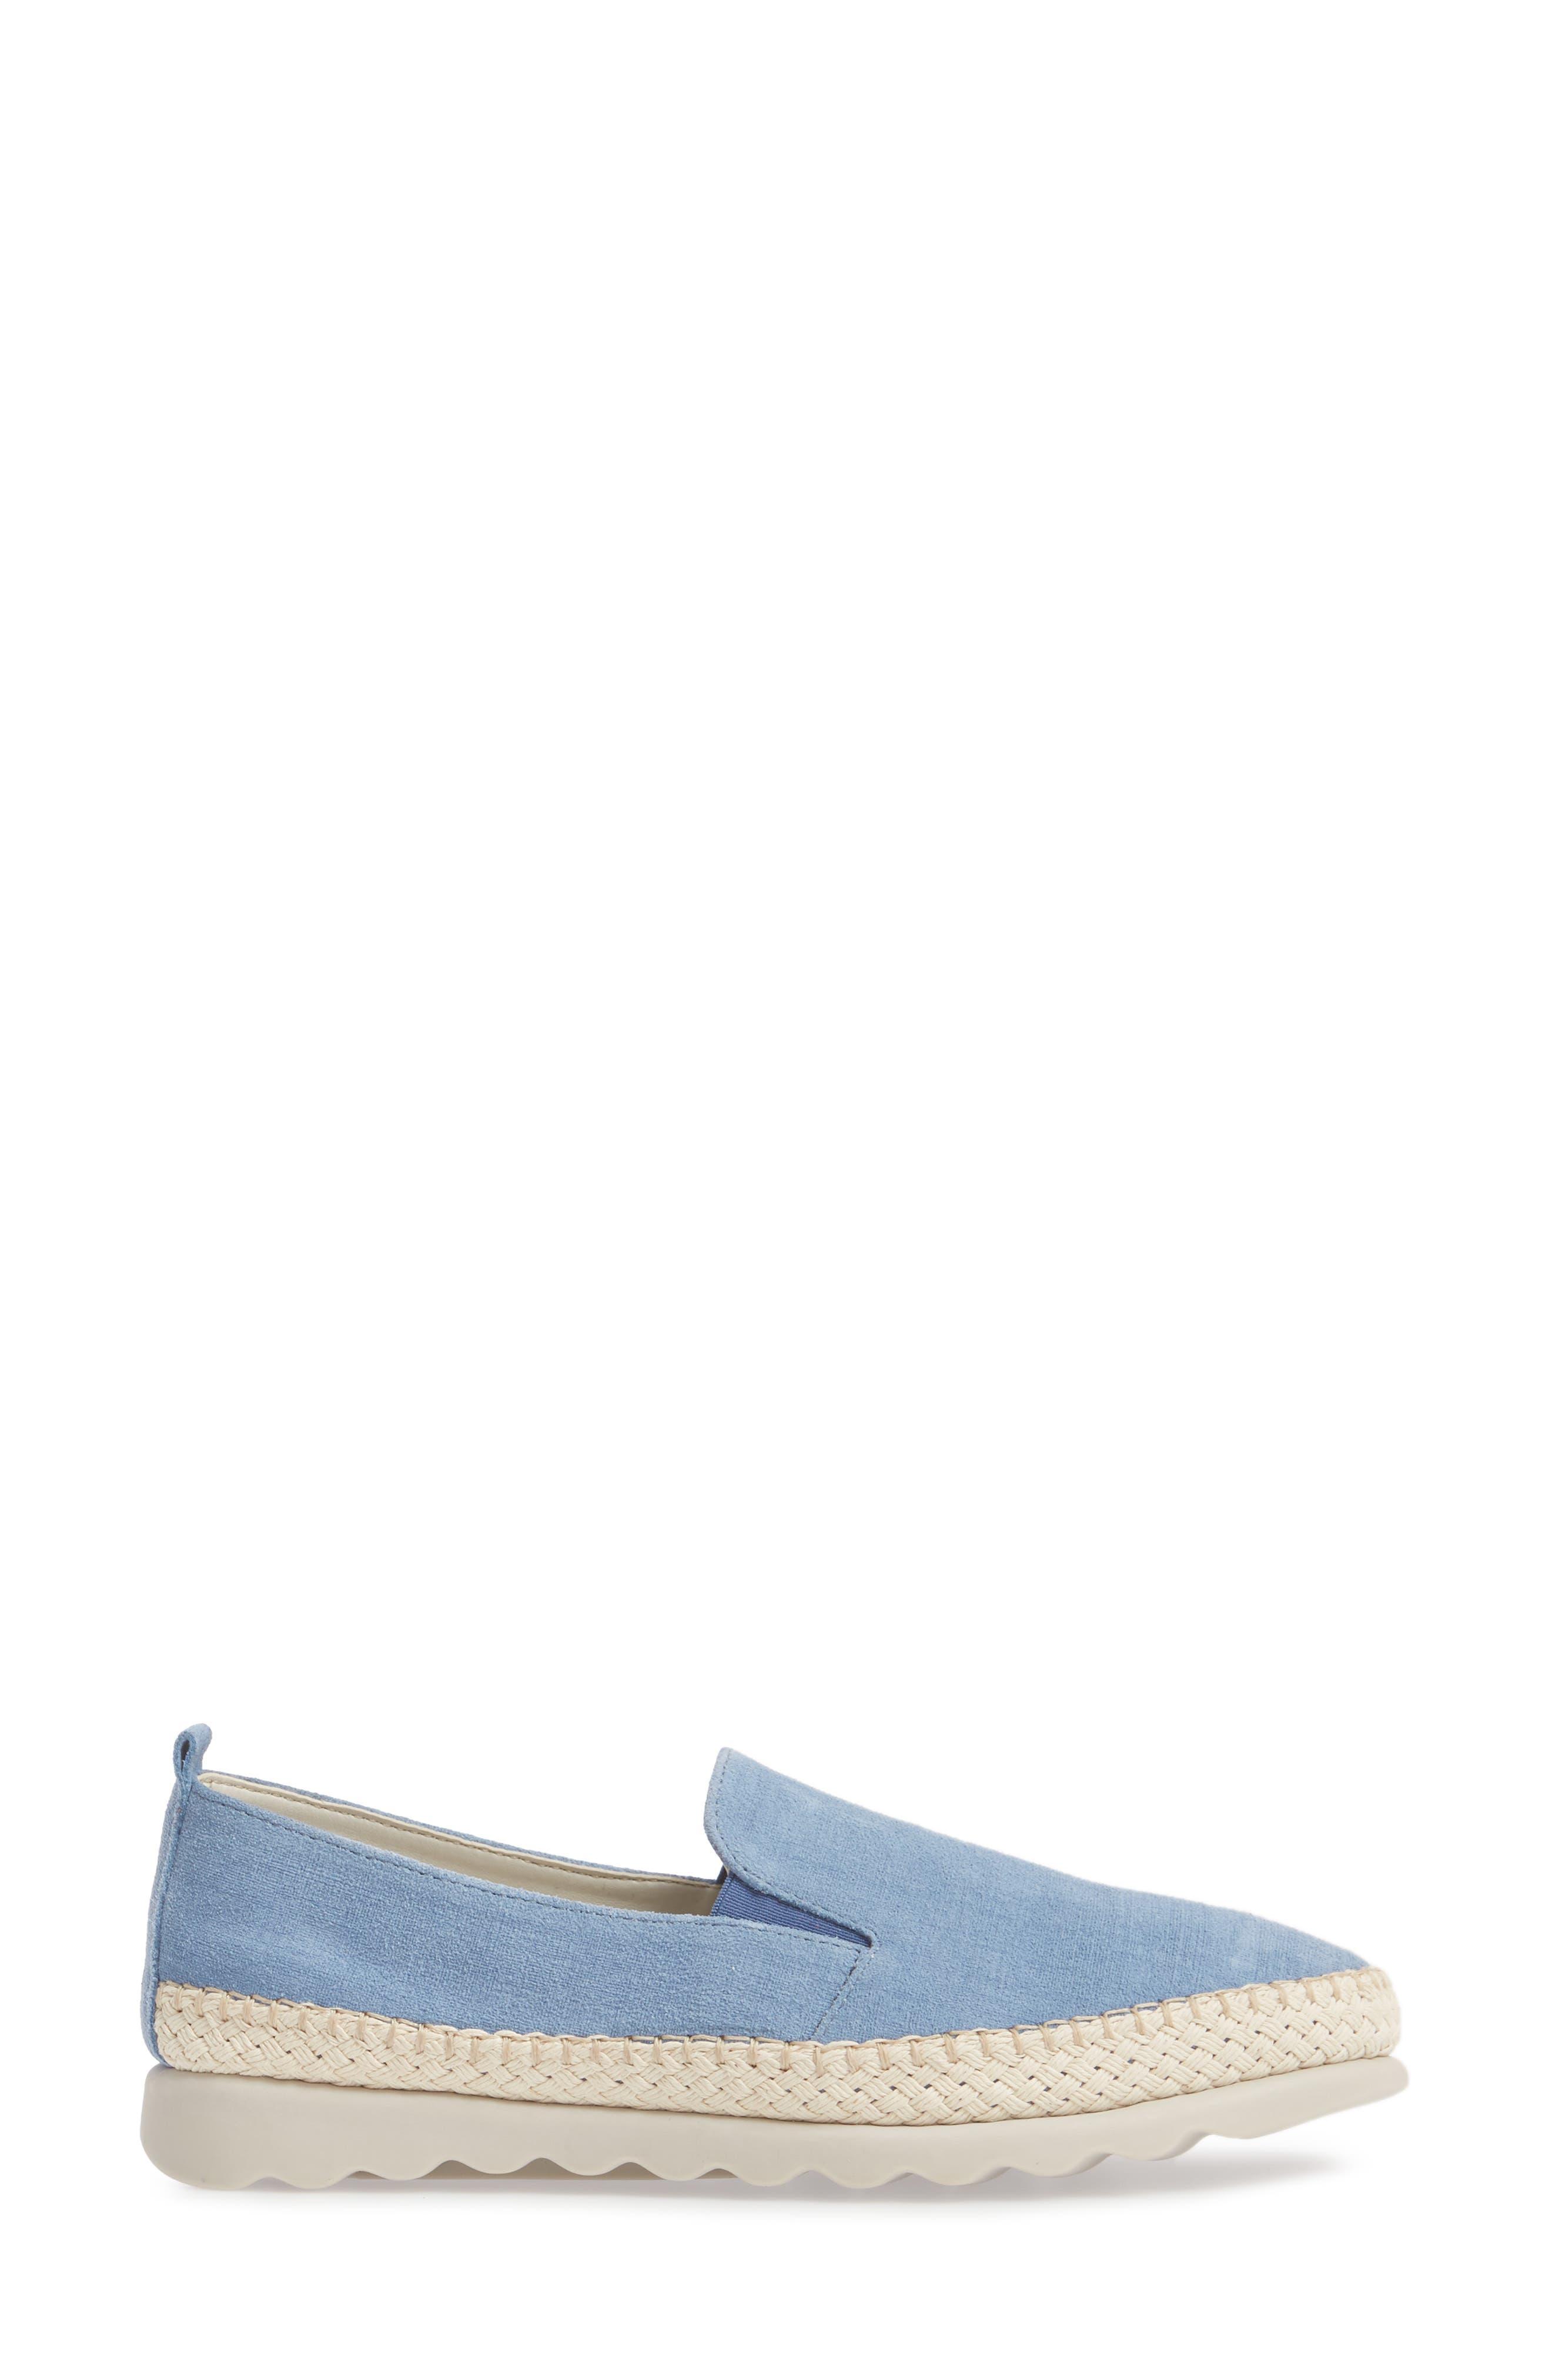 Chappie Slip-On Sneaker,                             Alternate thumbnail 3, color,                             Denim Printed Suede